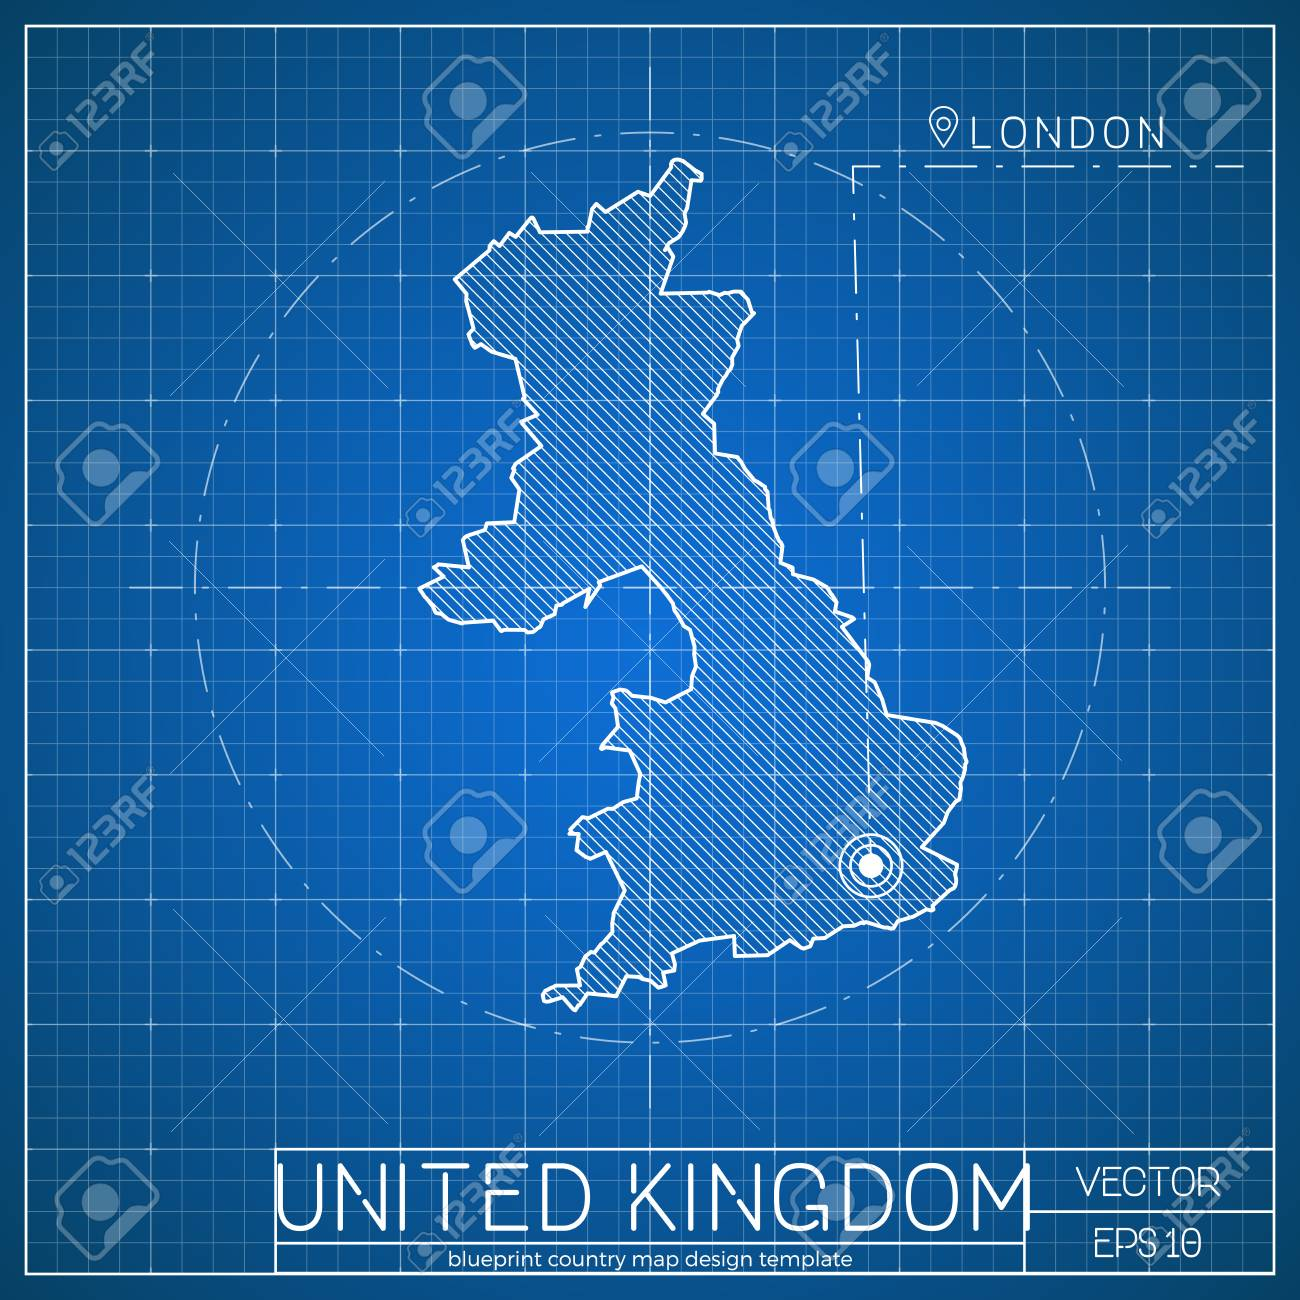 United kingdom blueprint map template with capital city london united kingdom blueprint map template with capital city london marked on blueprint british map malvernweather Images